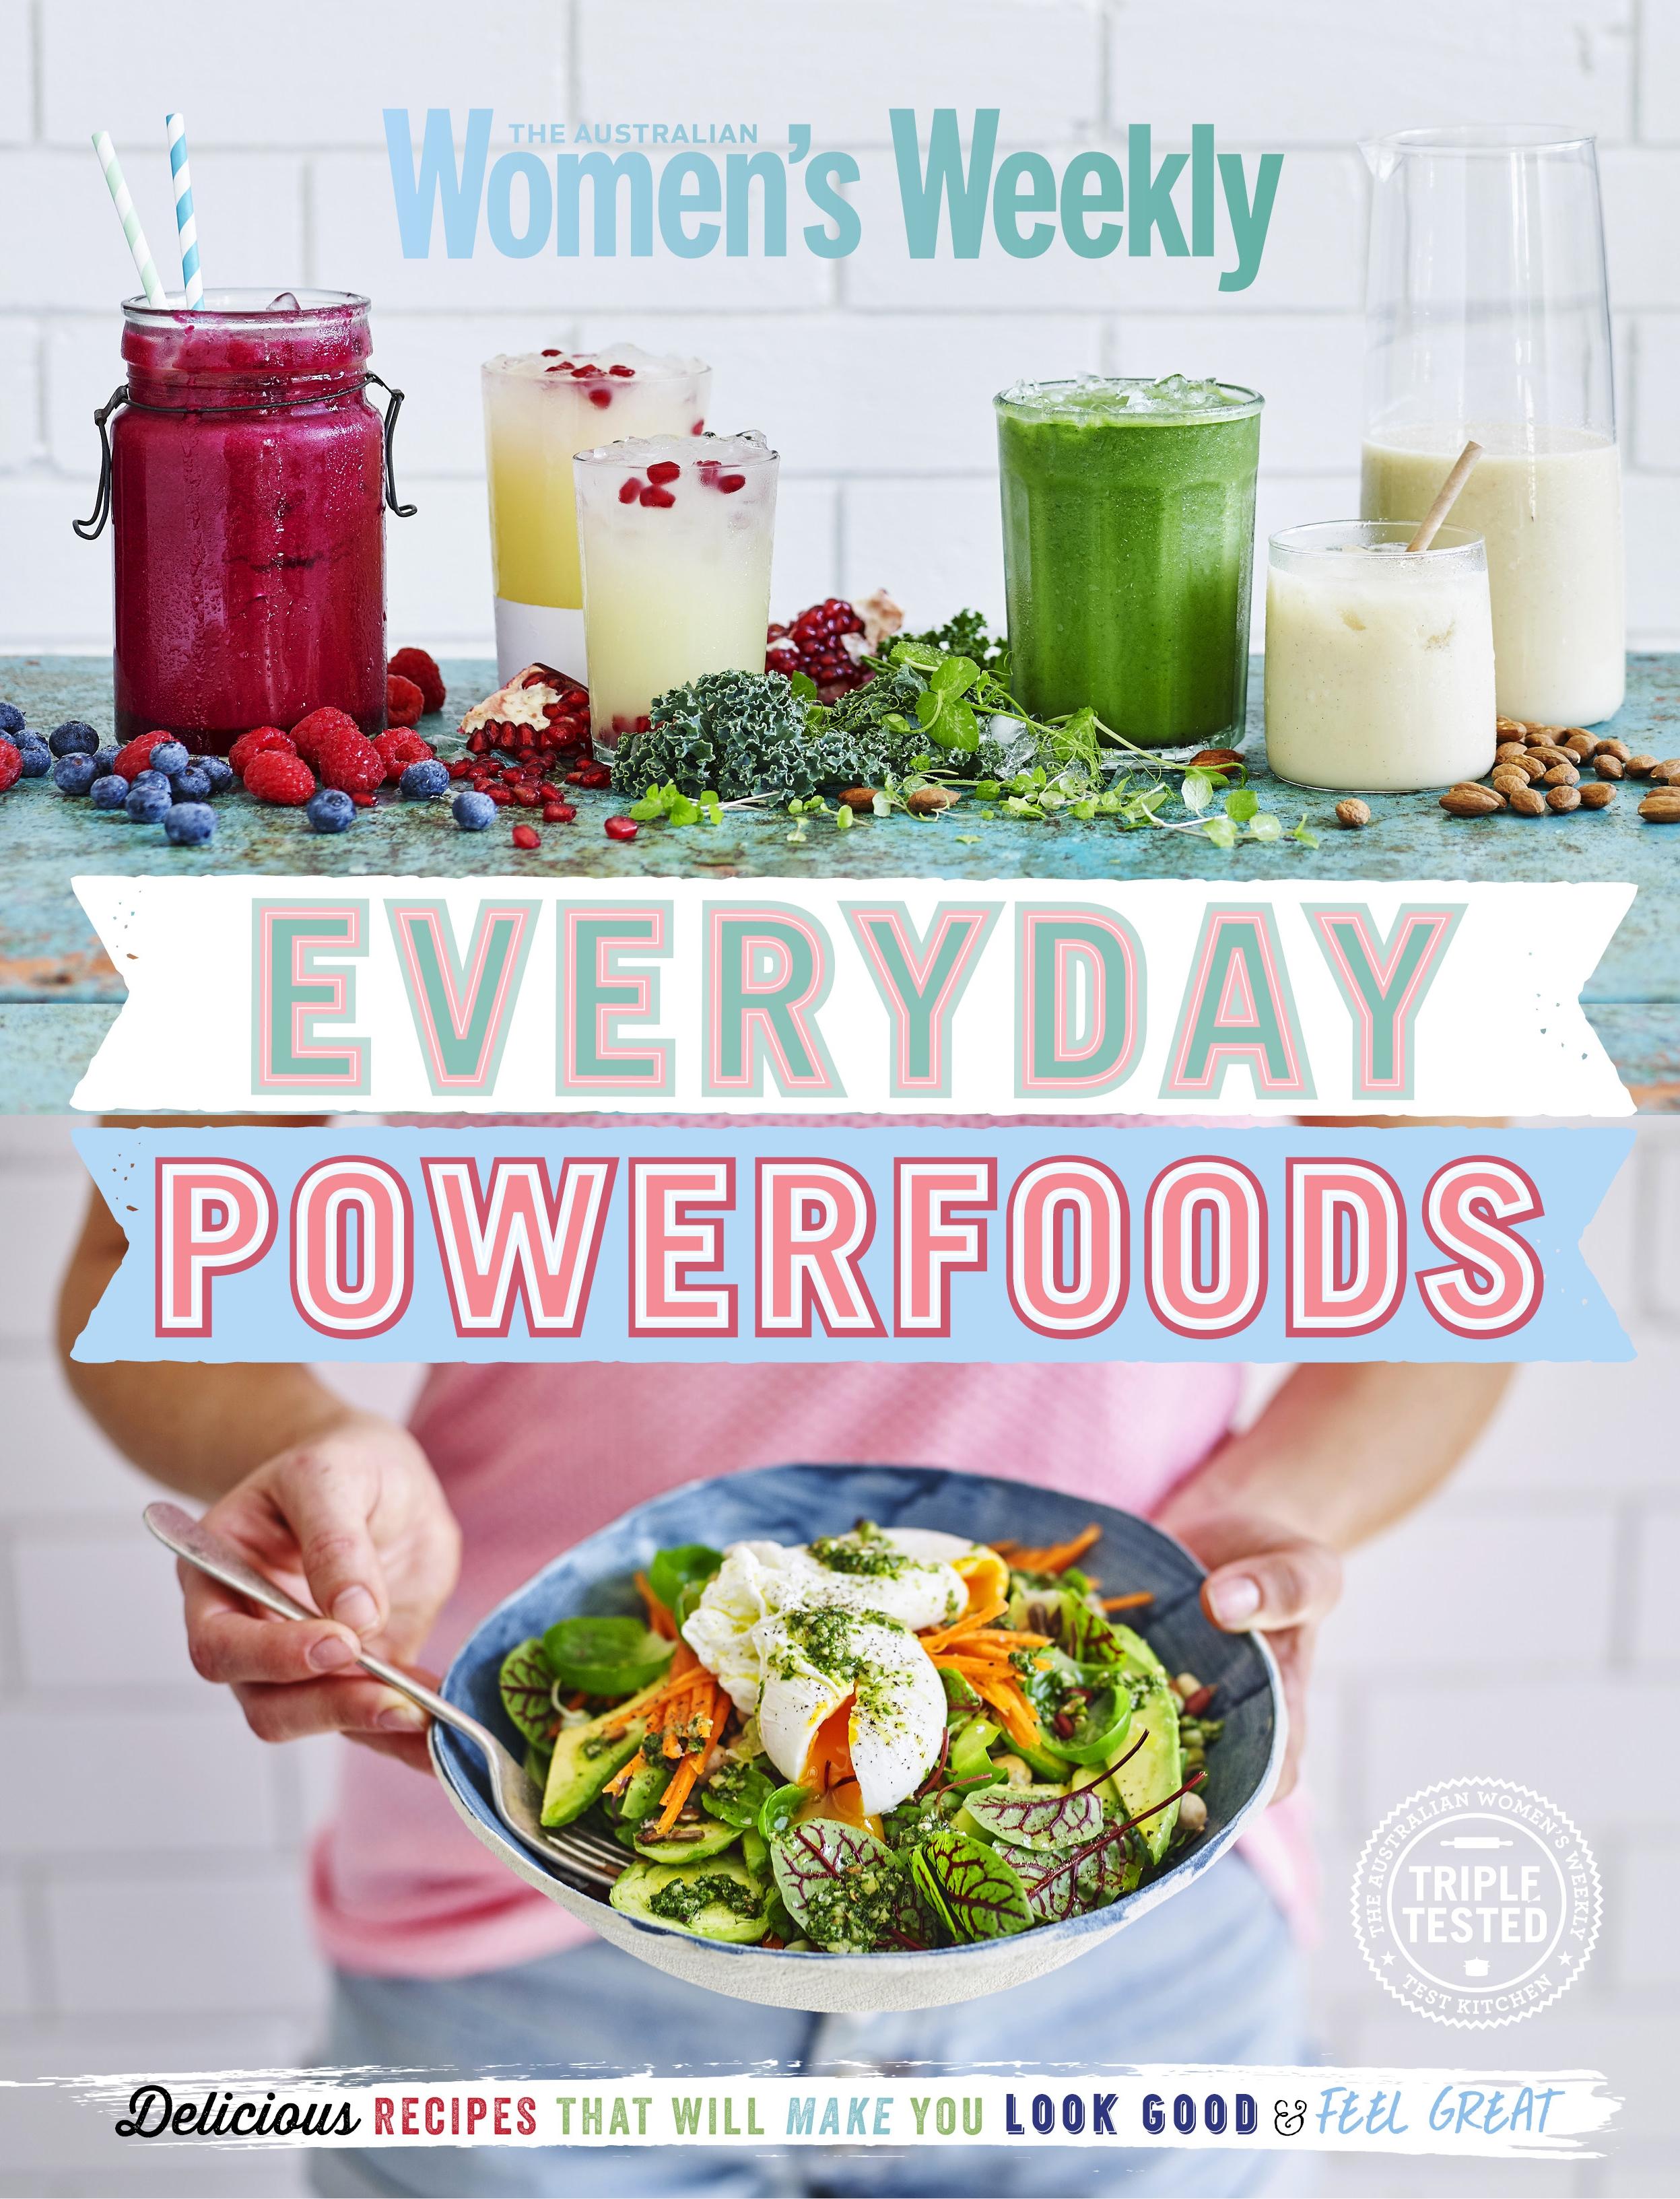 Food Book Cover Queensland ~ Everyday powerfoods by australian women s weekly